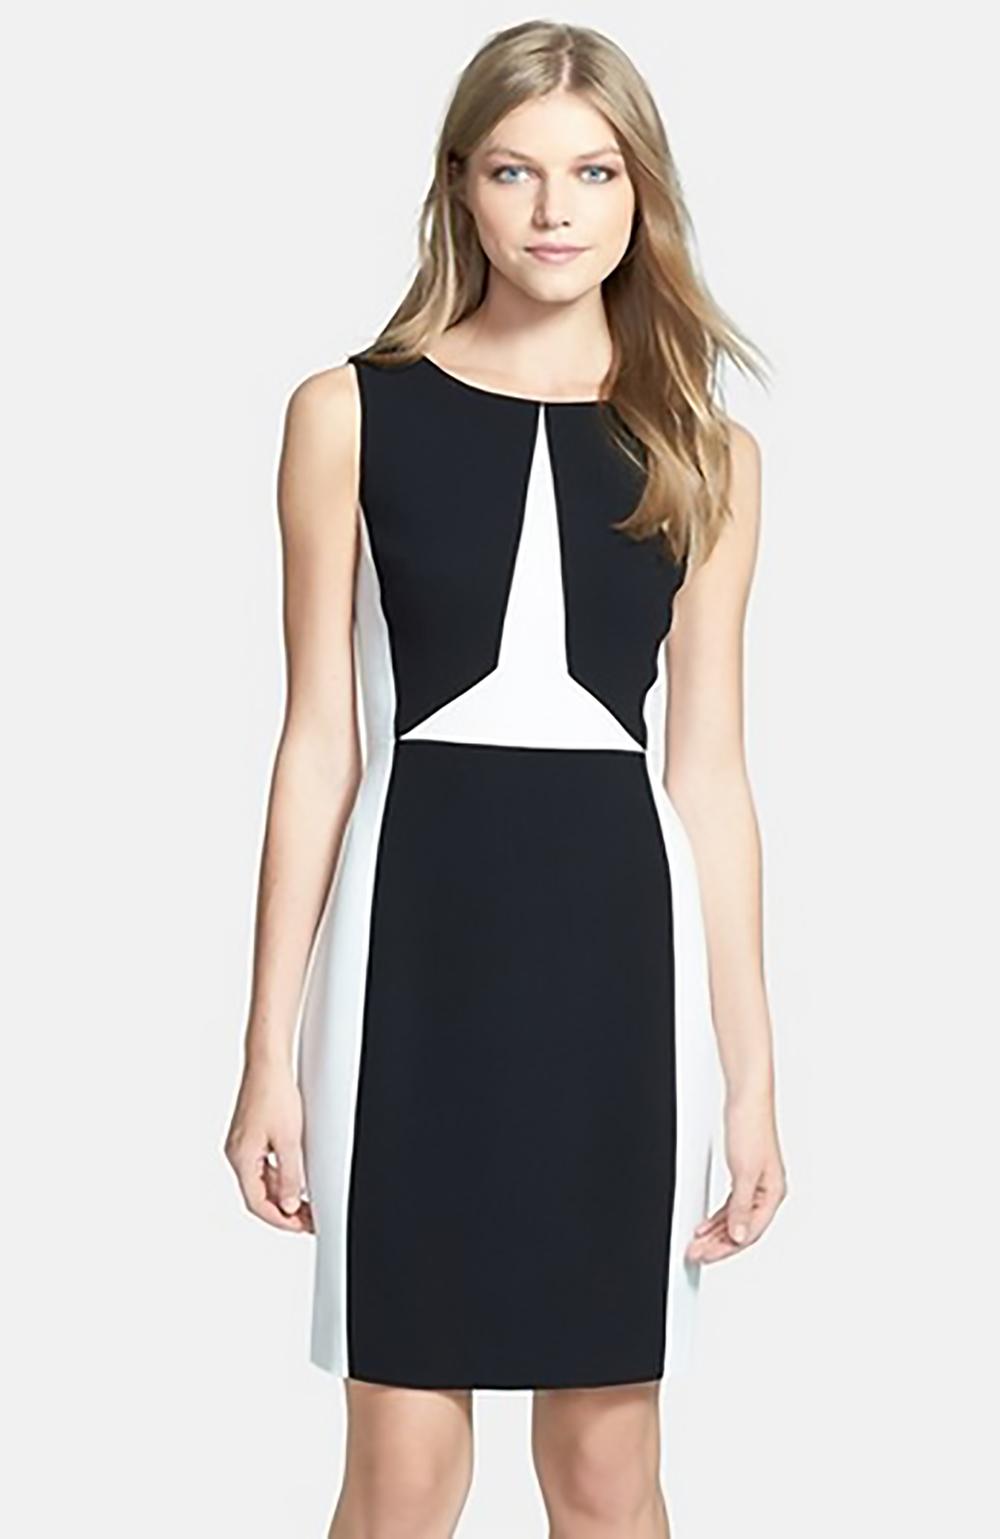 nordstrom ivanka trump colorblock sheath dress 1500.jpg